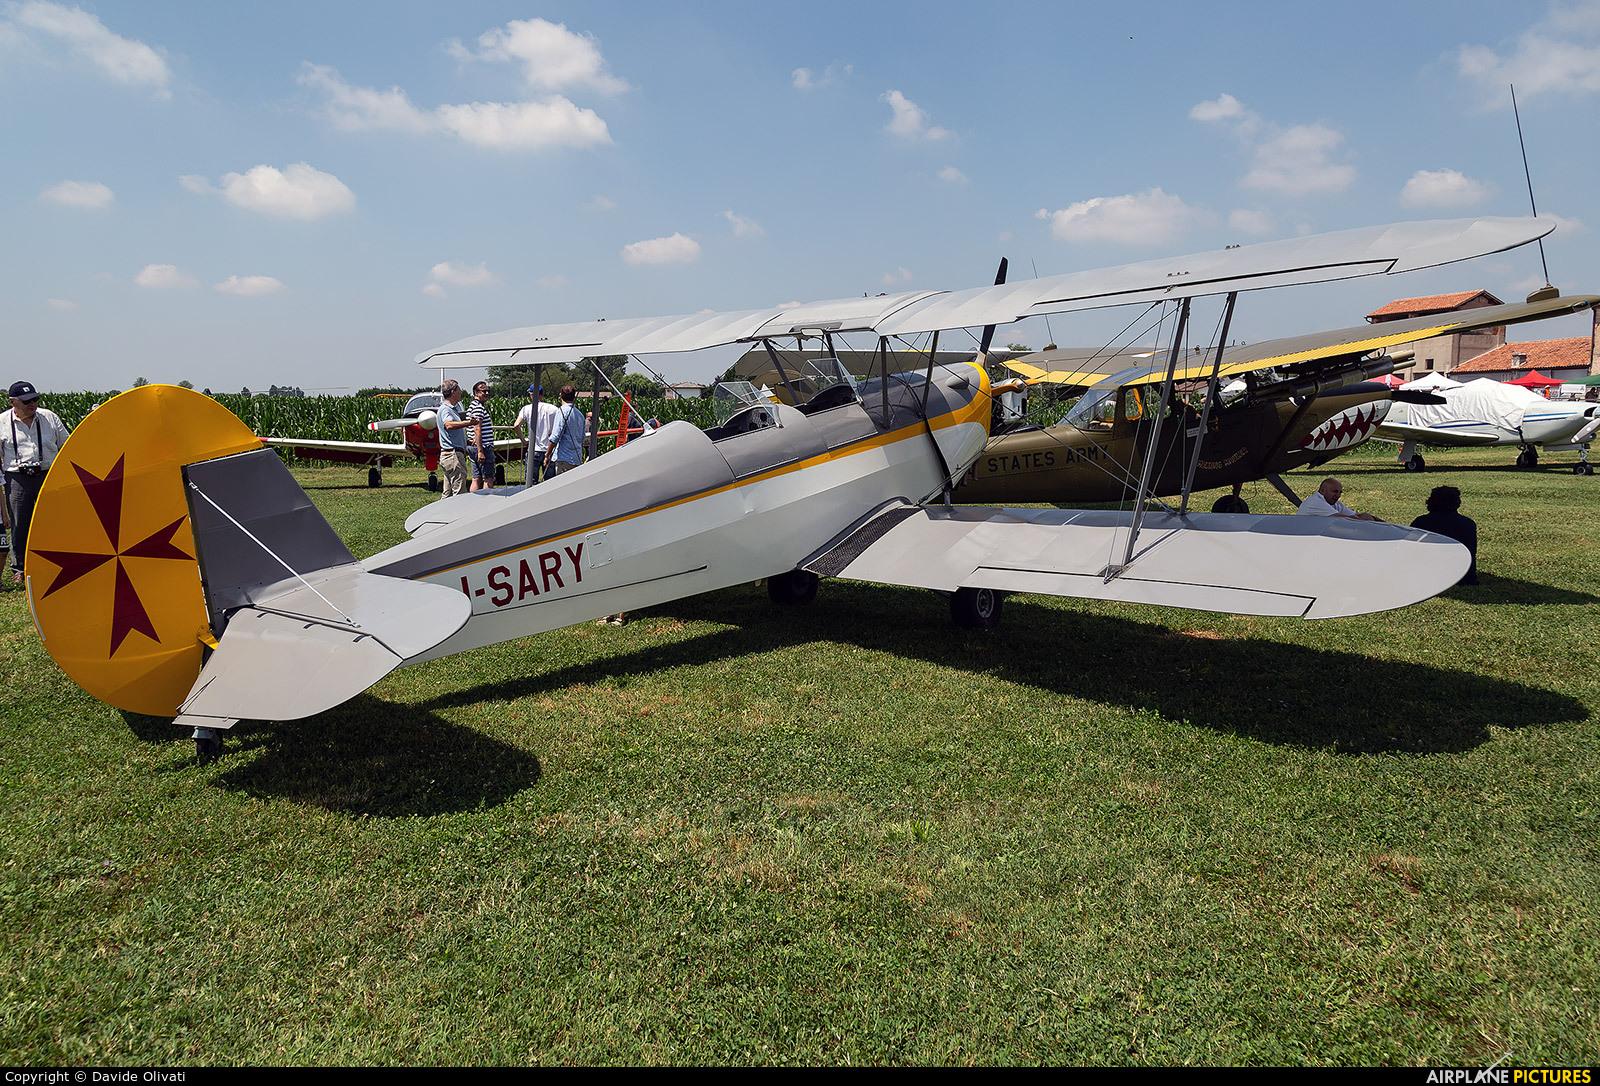 Private I-SARY aircraft at Bagnoli di Sopra